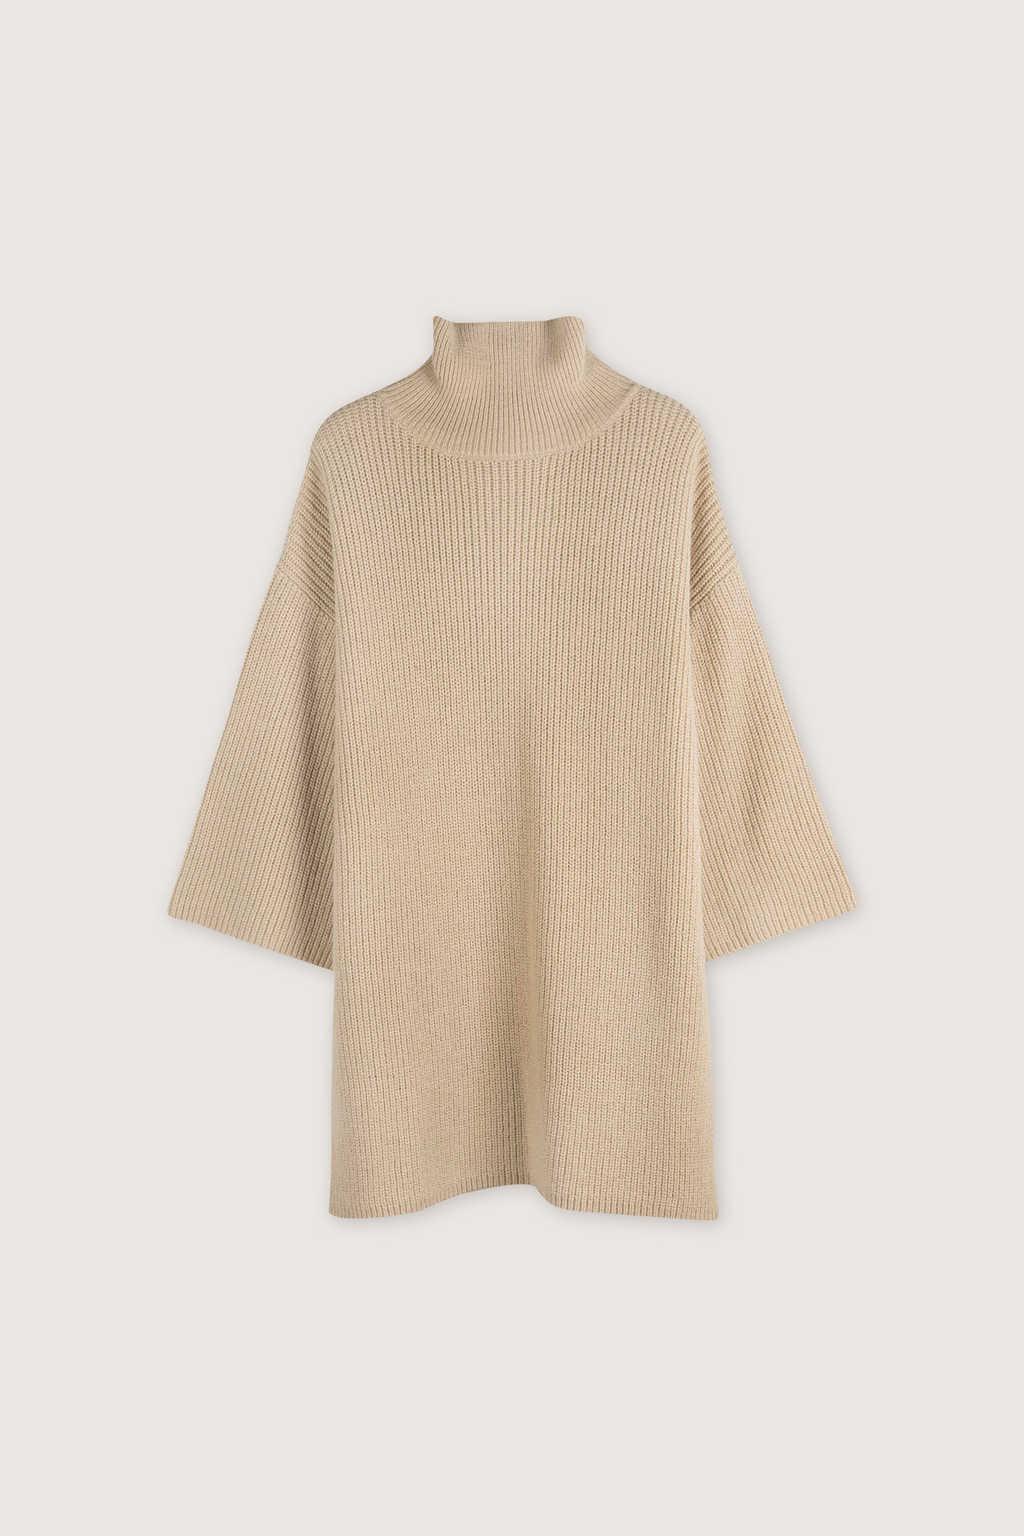 Sweater 2287 Beige 5